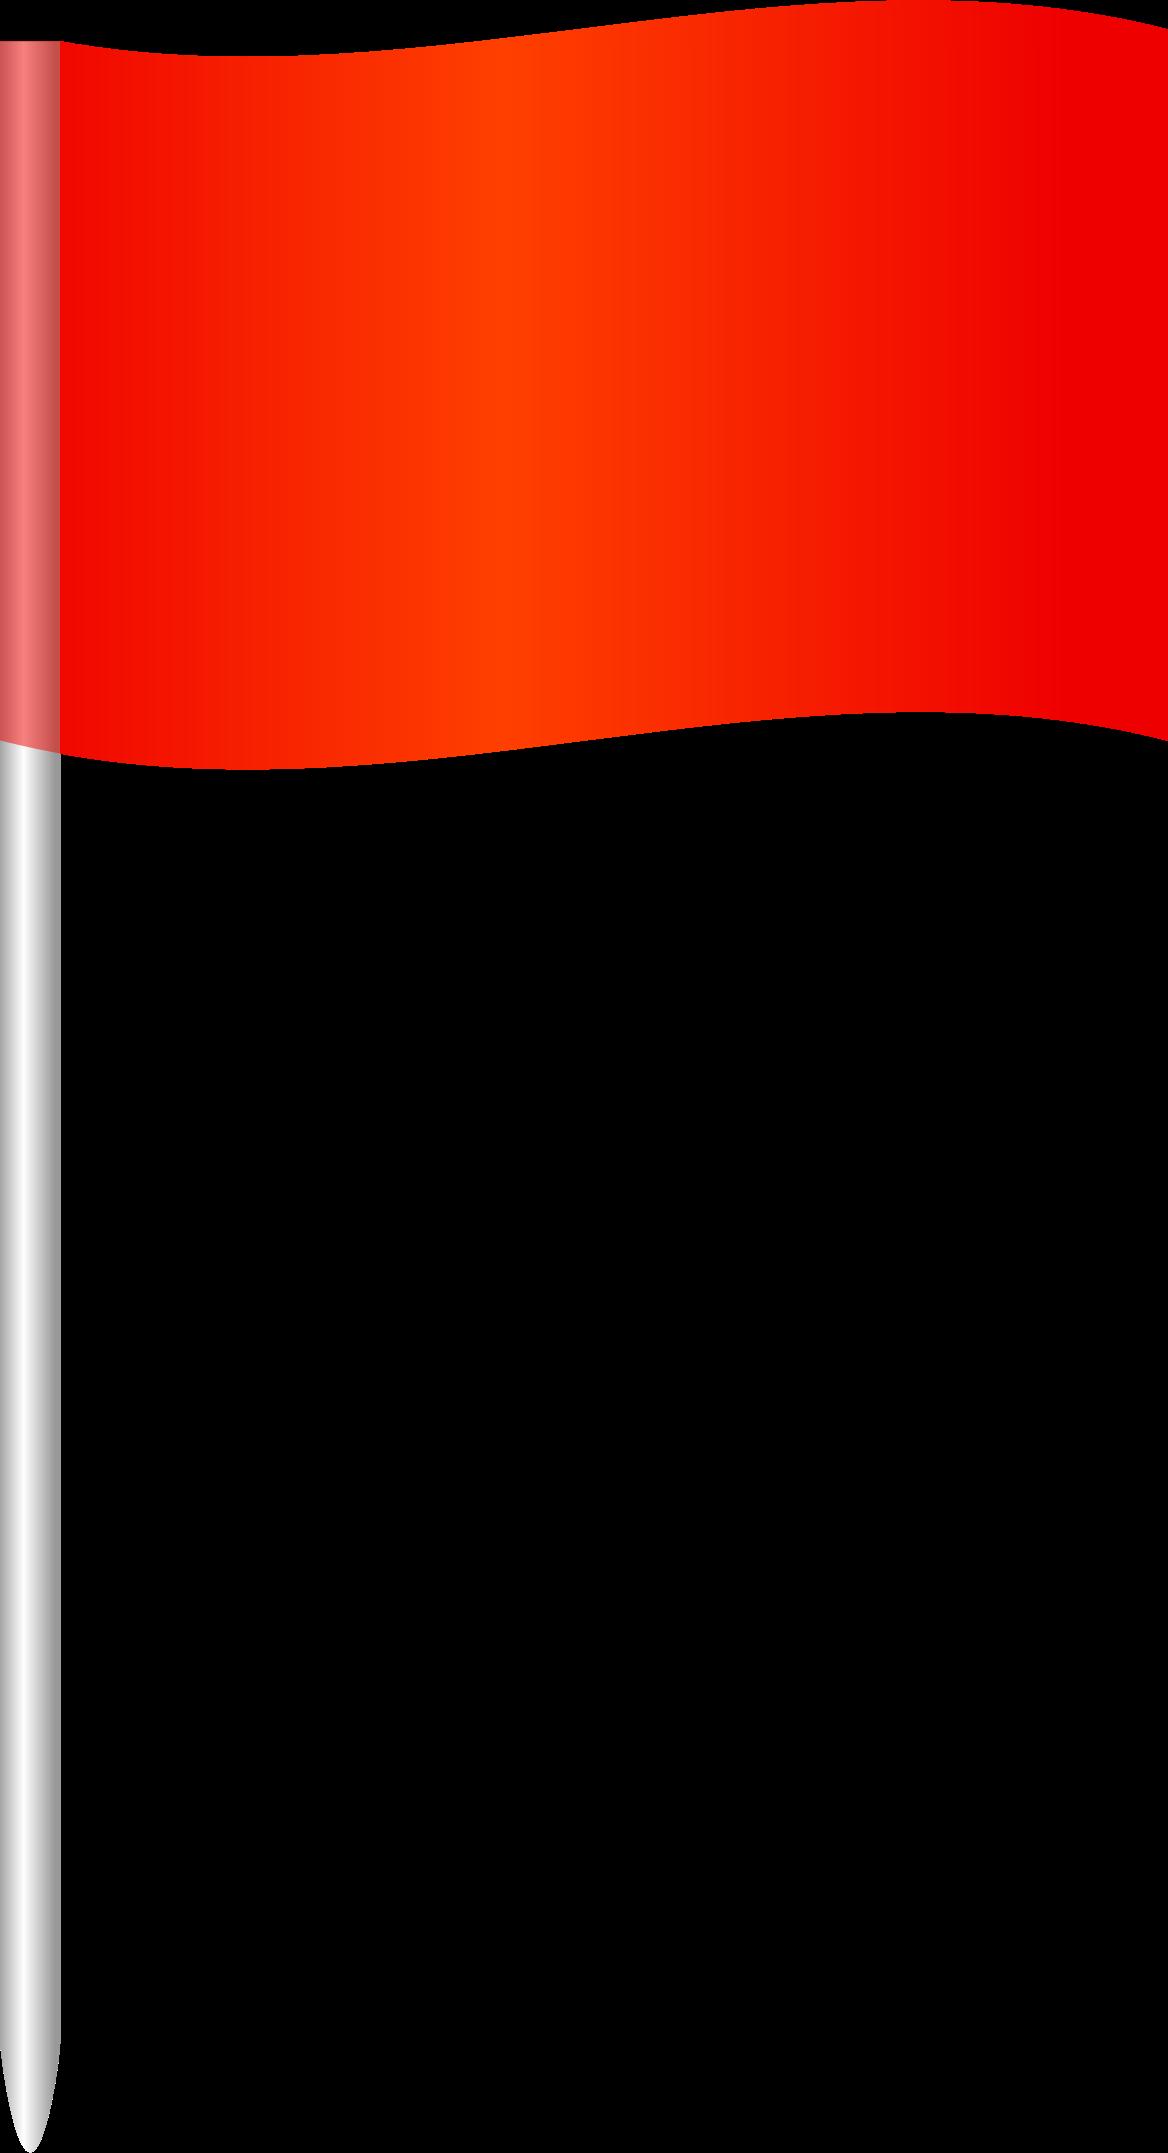 Big Image (Png) - Flag, Transparent background PNG HD thumbnail